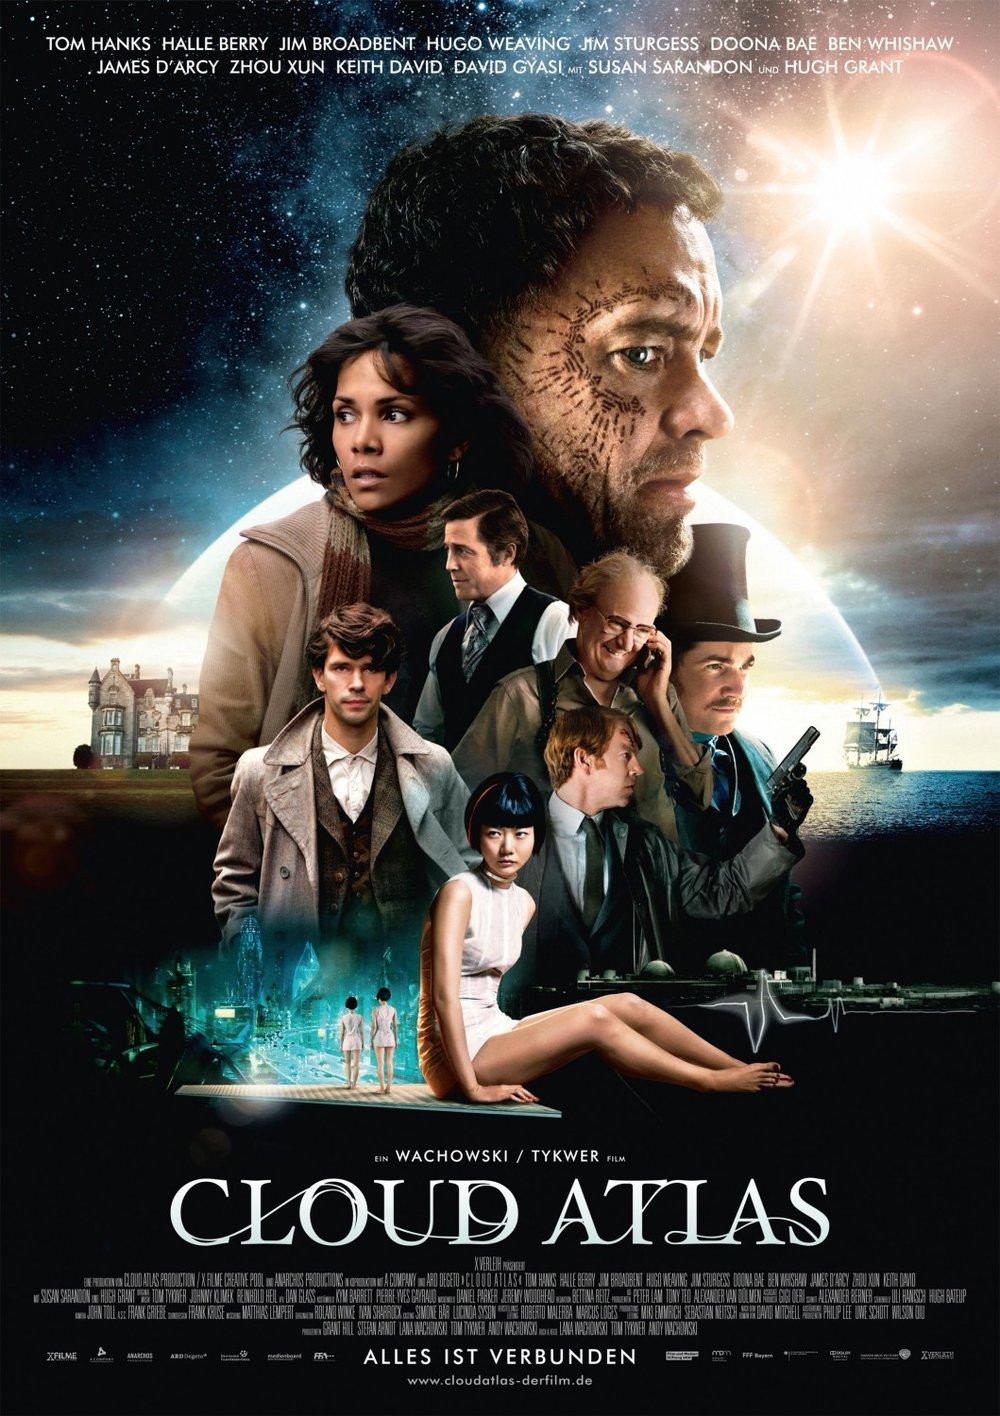 Cloud Atlas Film Movie Poster